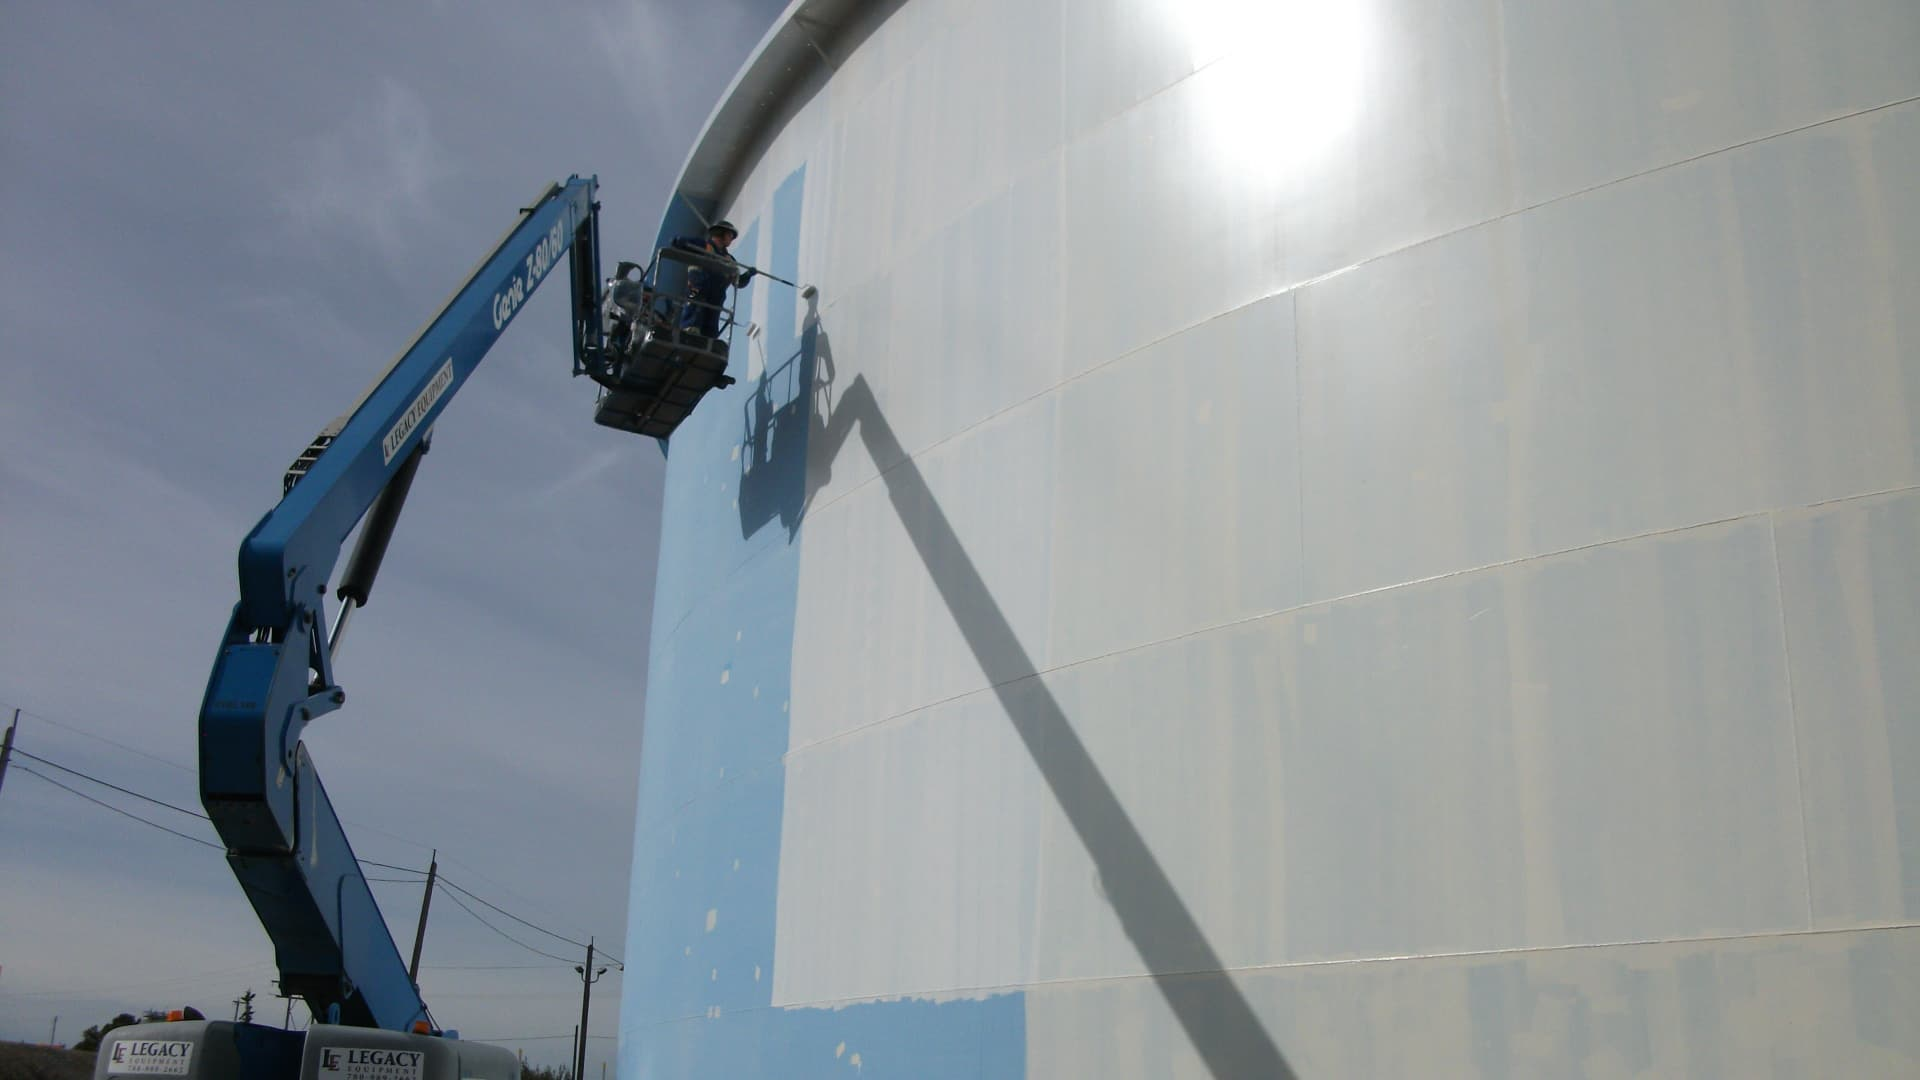 Man painting a white storage tank